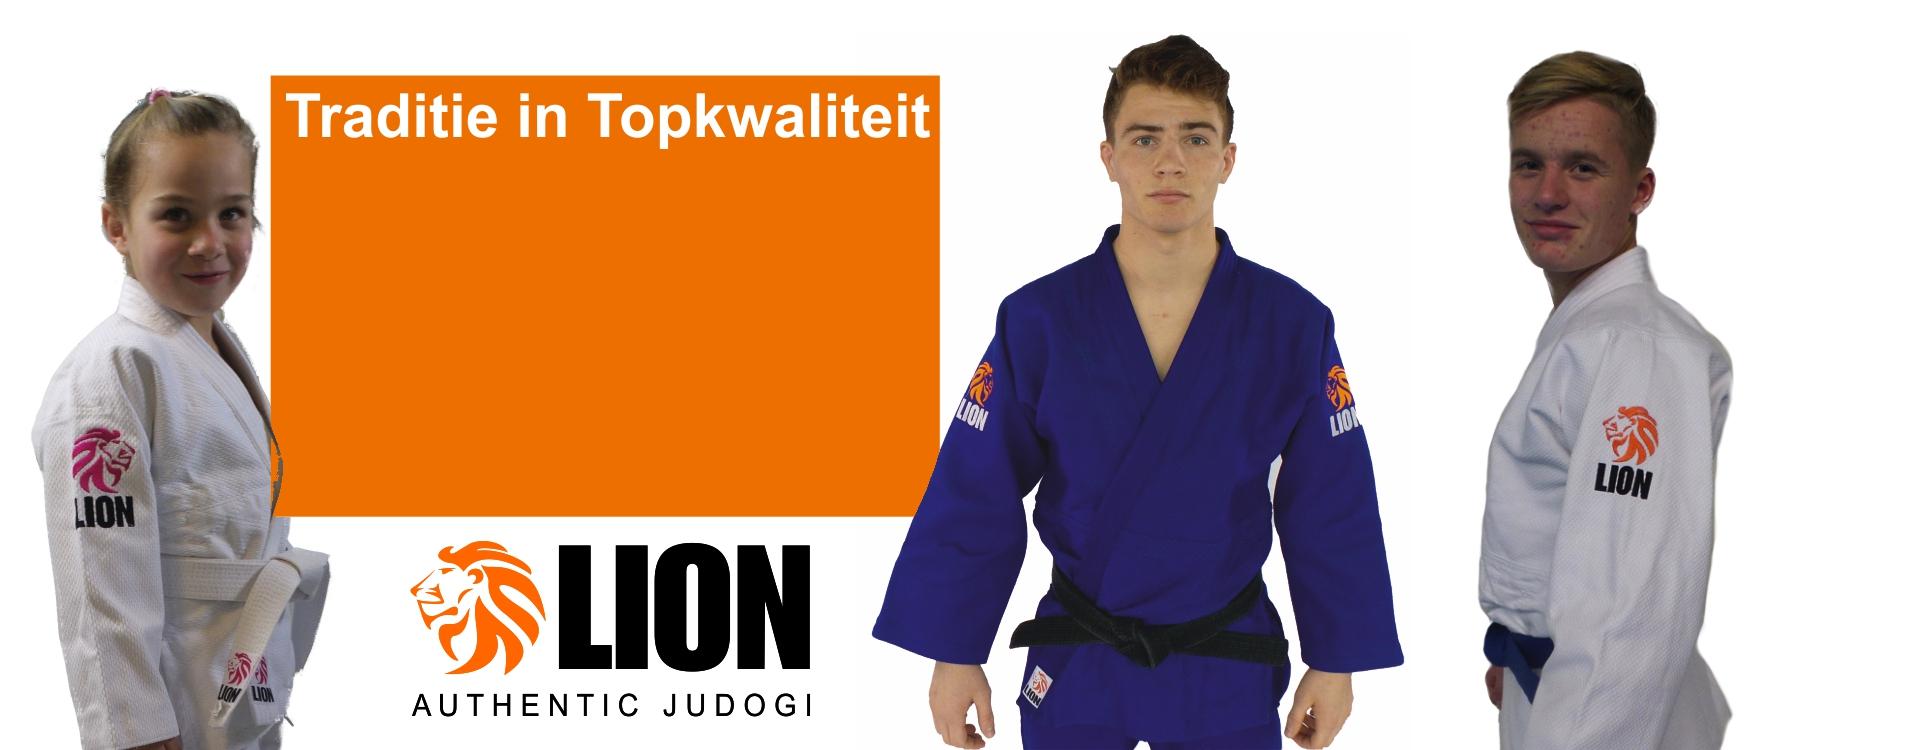 https://nieuwjudopak.nl/wp-content/uploads/2018/01/shop-home-gallery-banner-Lion-judogi-2018-judogi-collectie.jpg